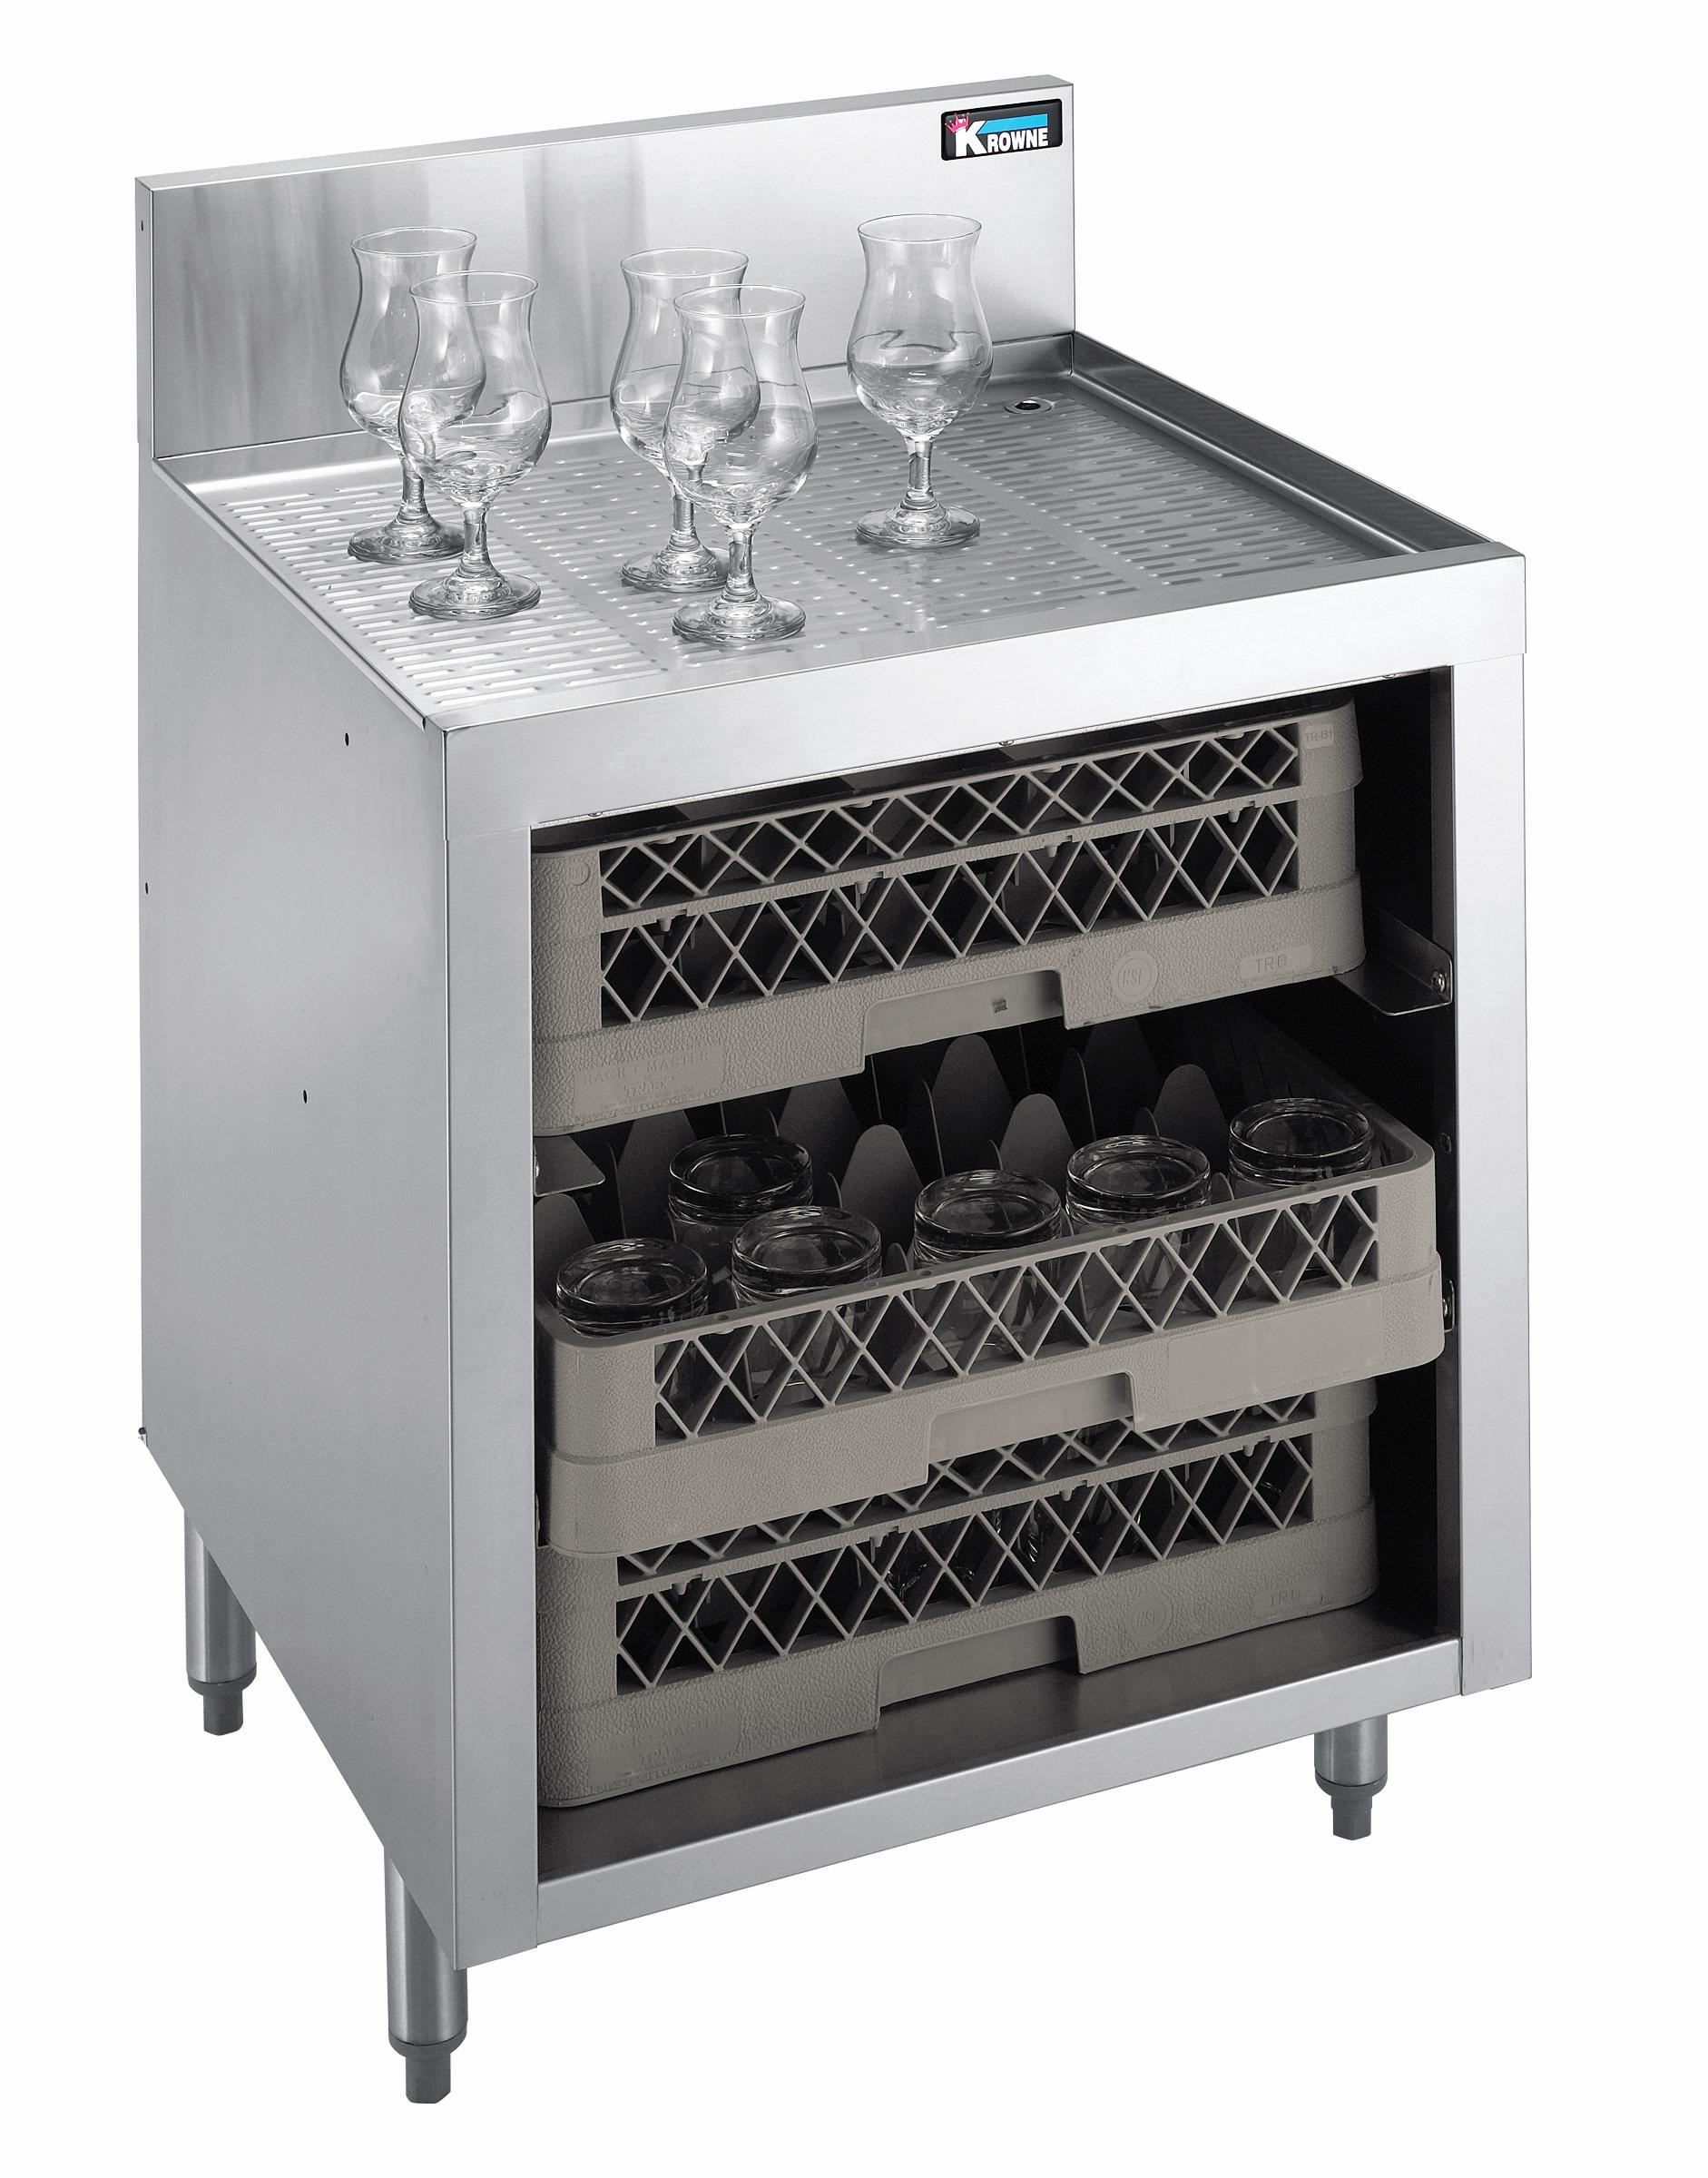 Krowne Metal 21-GSB1 underbar glass rack storage unit